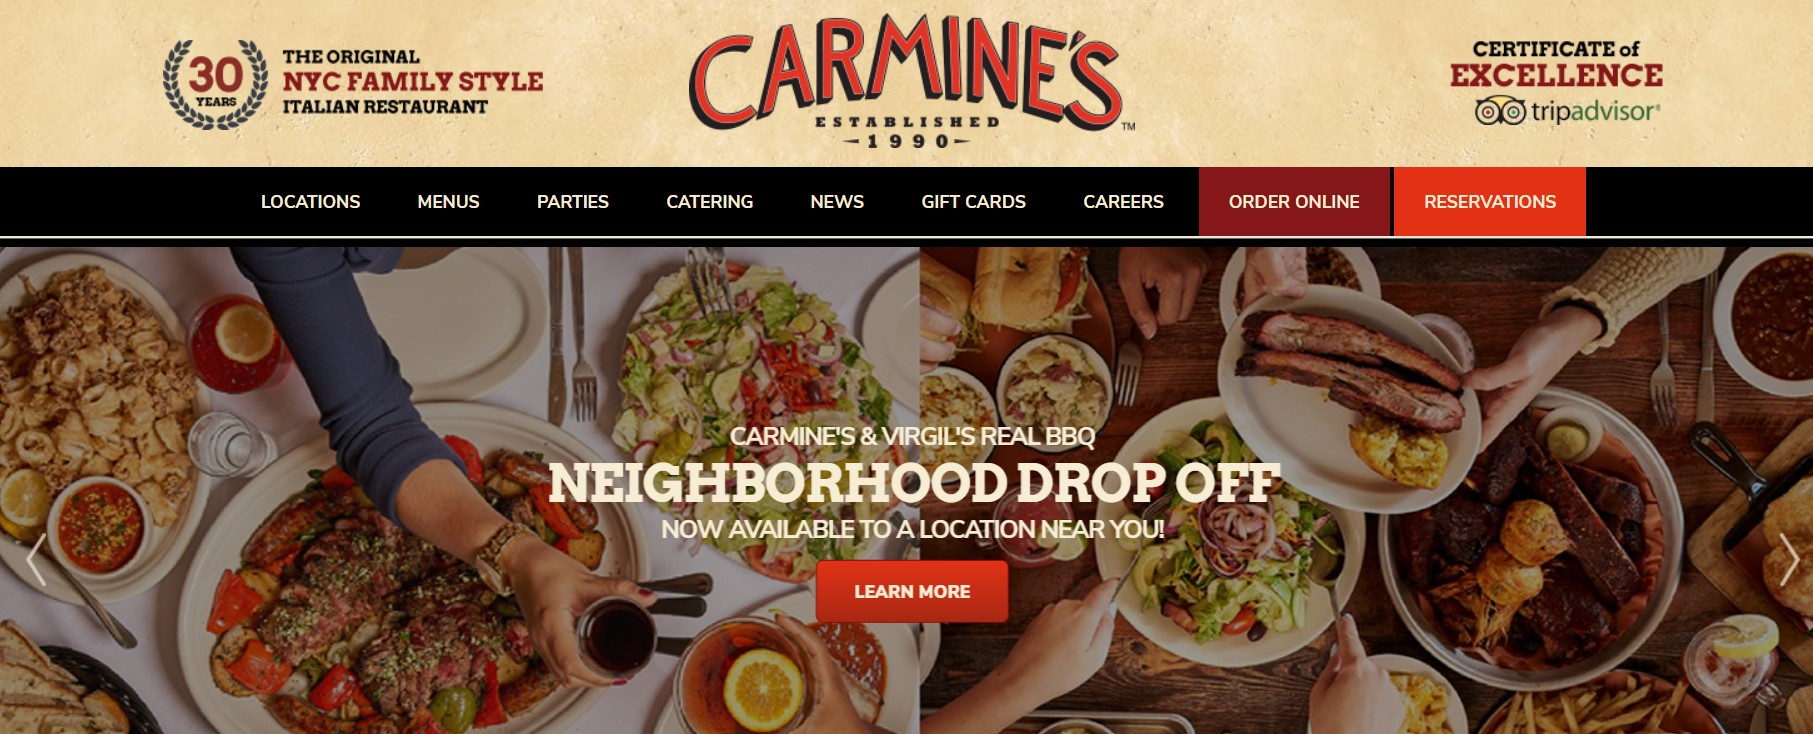 carmine's restaurant in new york